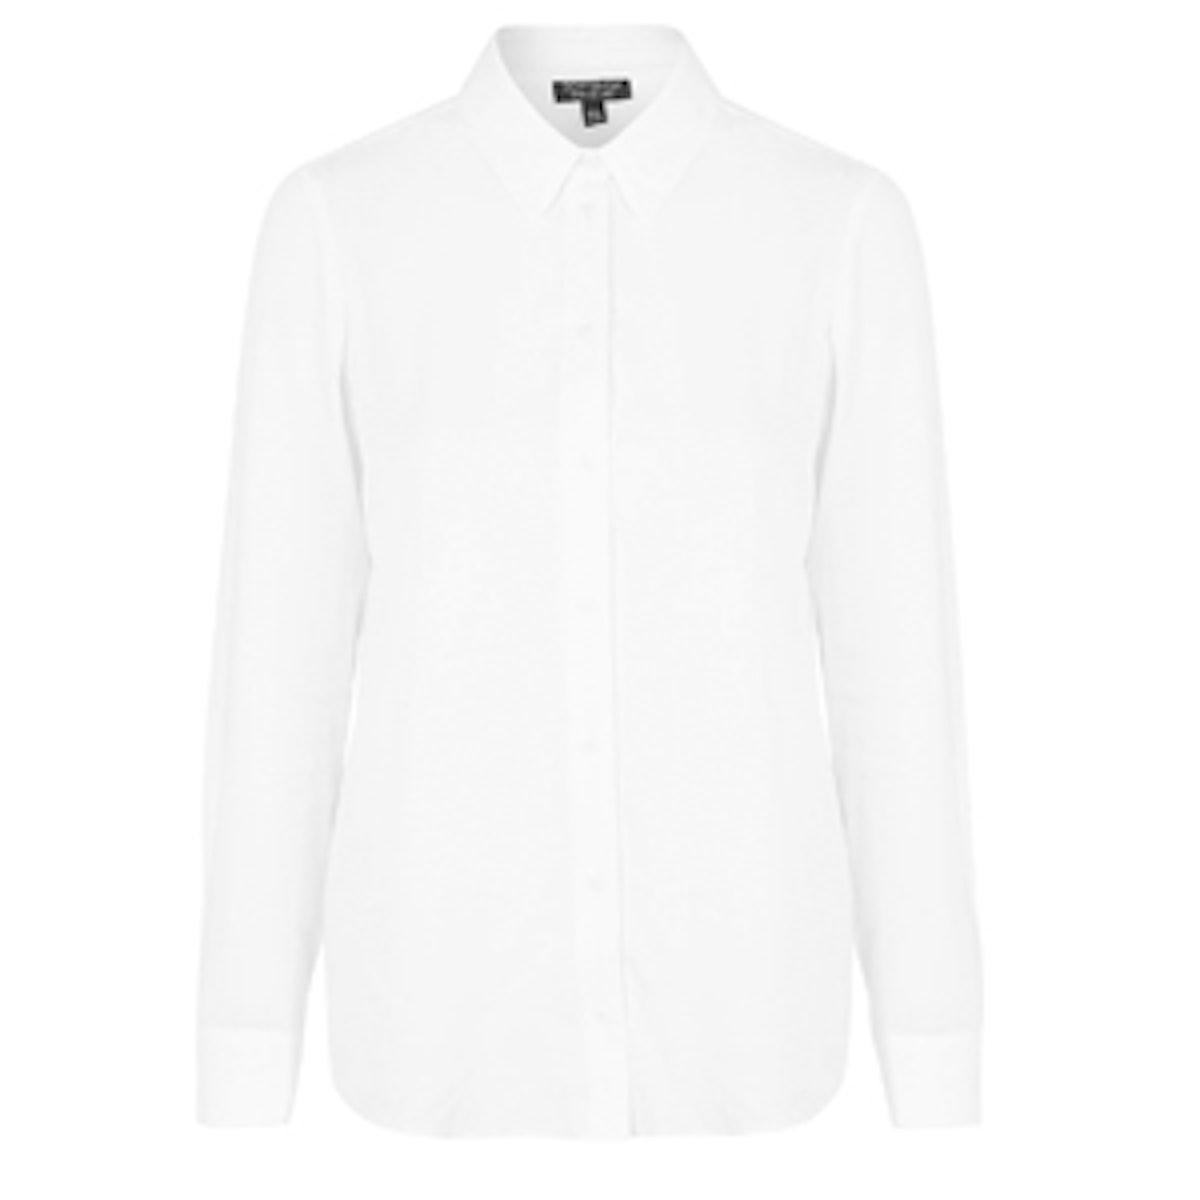 '70s High Collar Shirt